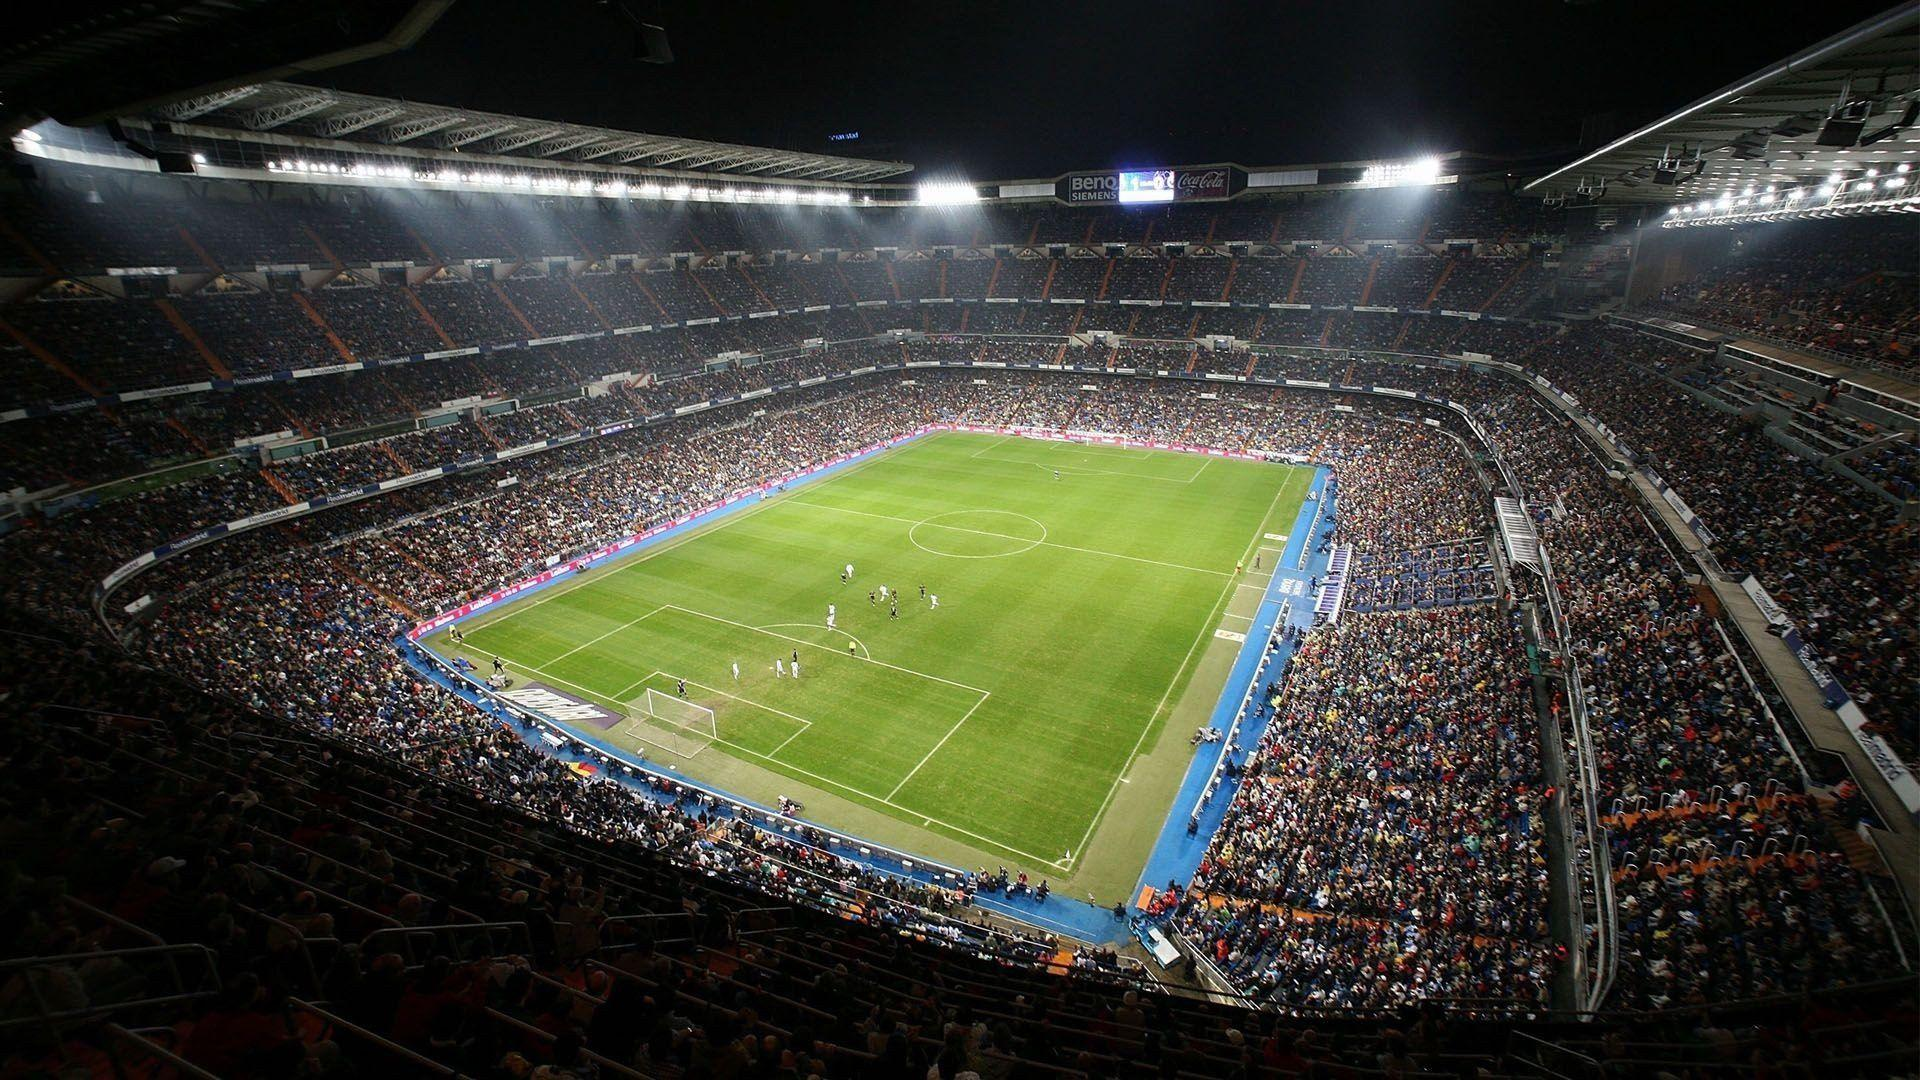 Oregon Football Wallpaper Hd Real Madrid Santiago Bernabeu Stadium Wallpapers